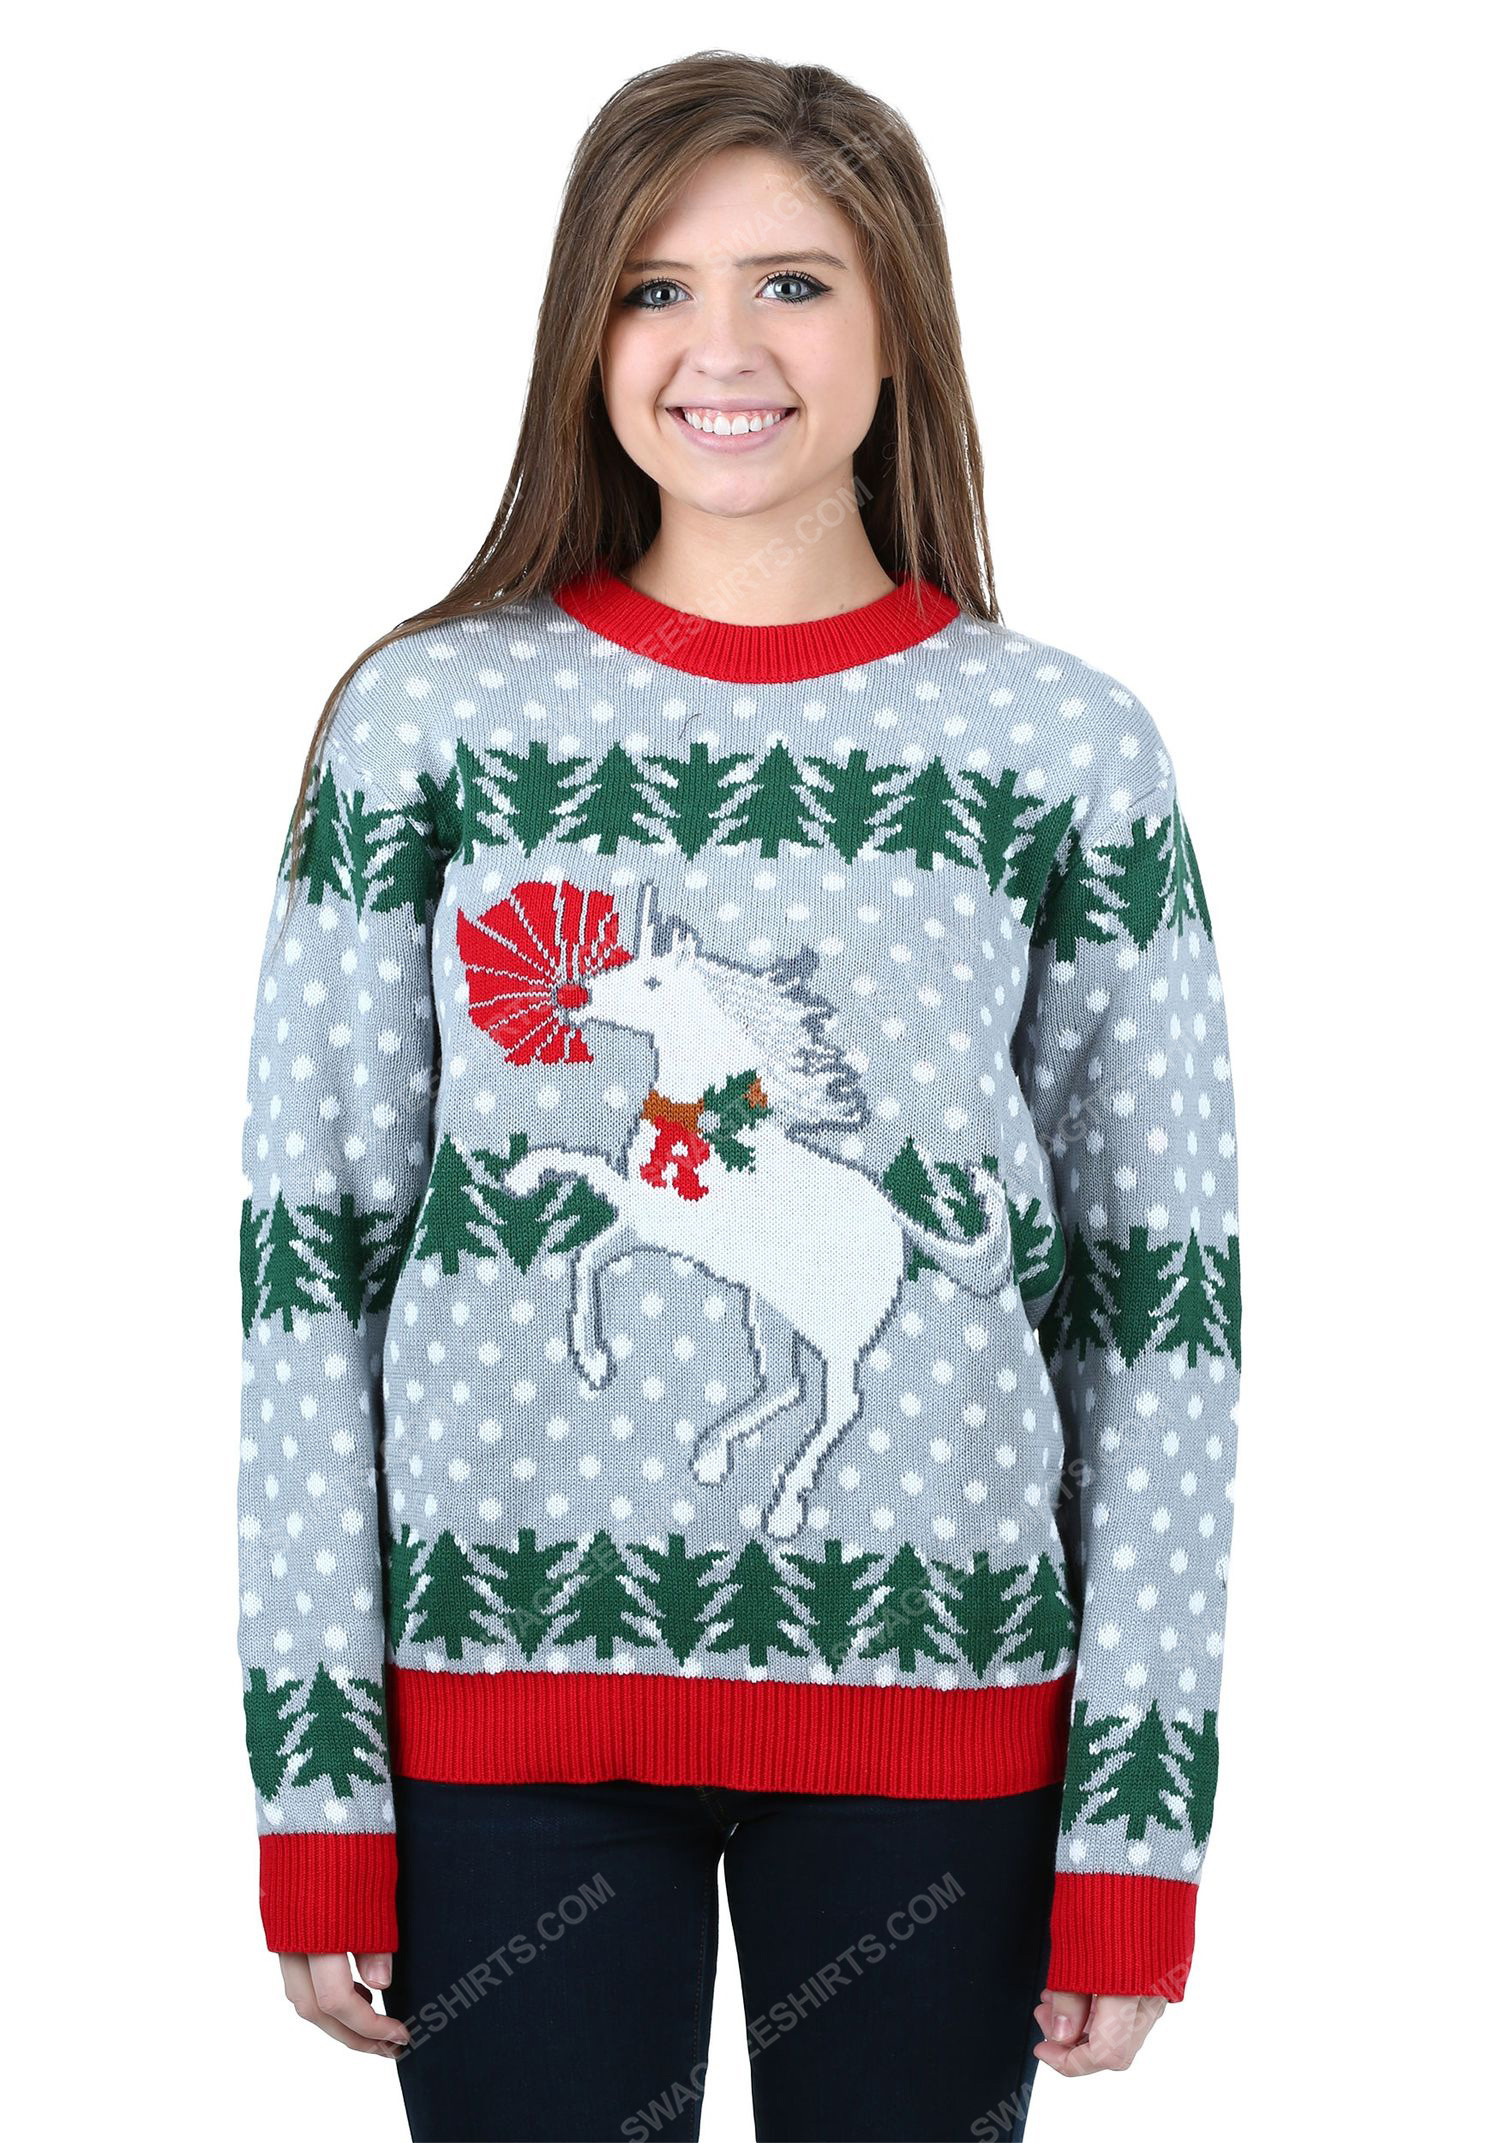 Christmas holiday unicorn rudolph full print ugly christmas sweater 2 - Copy (2)